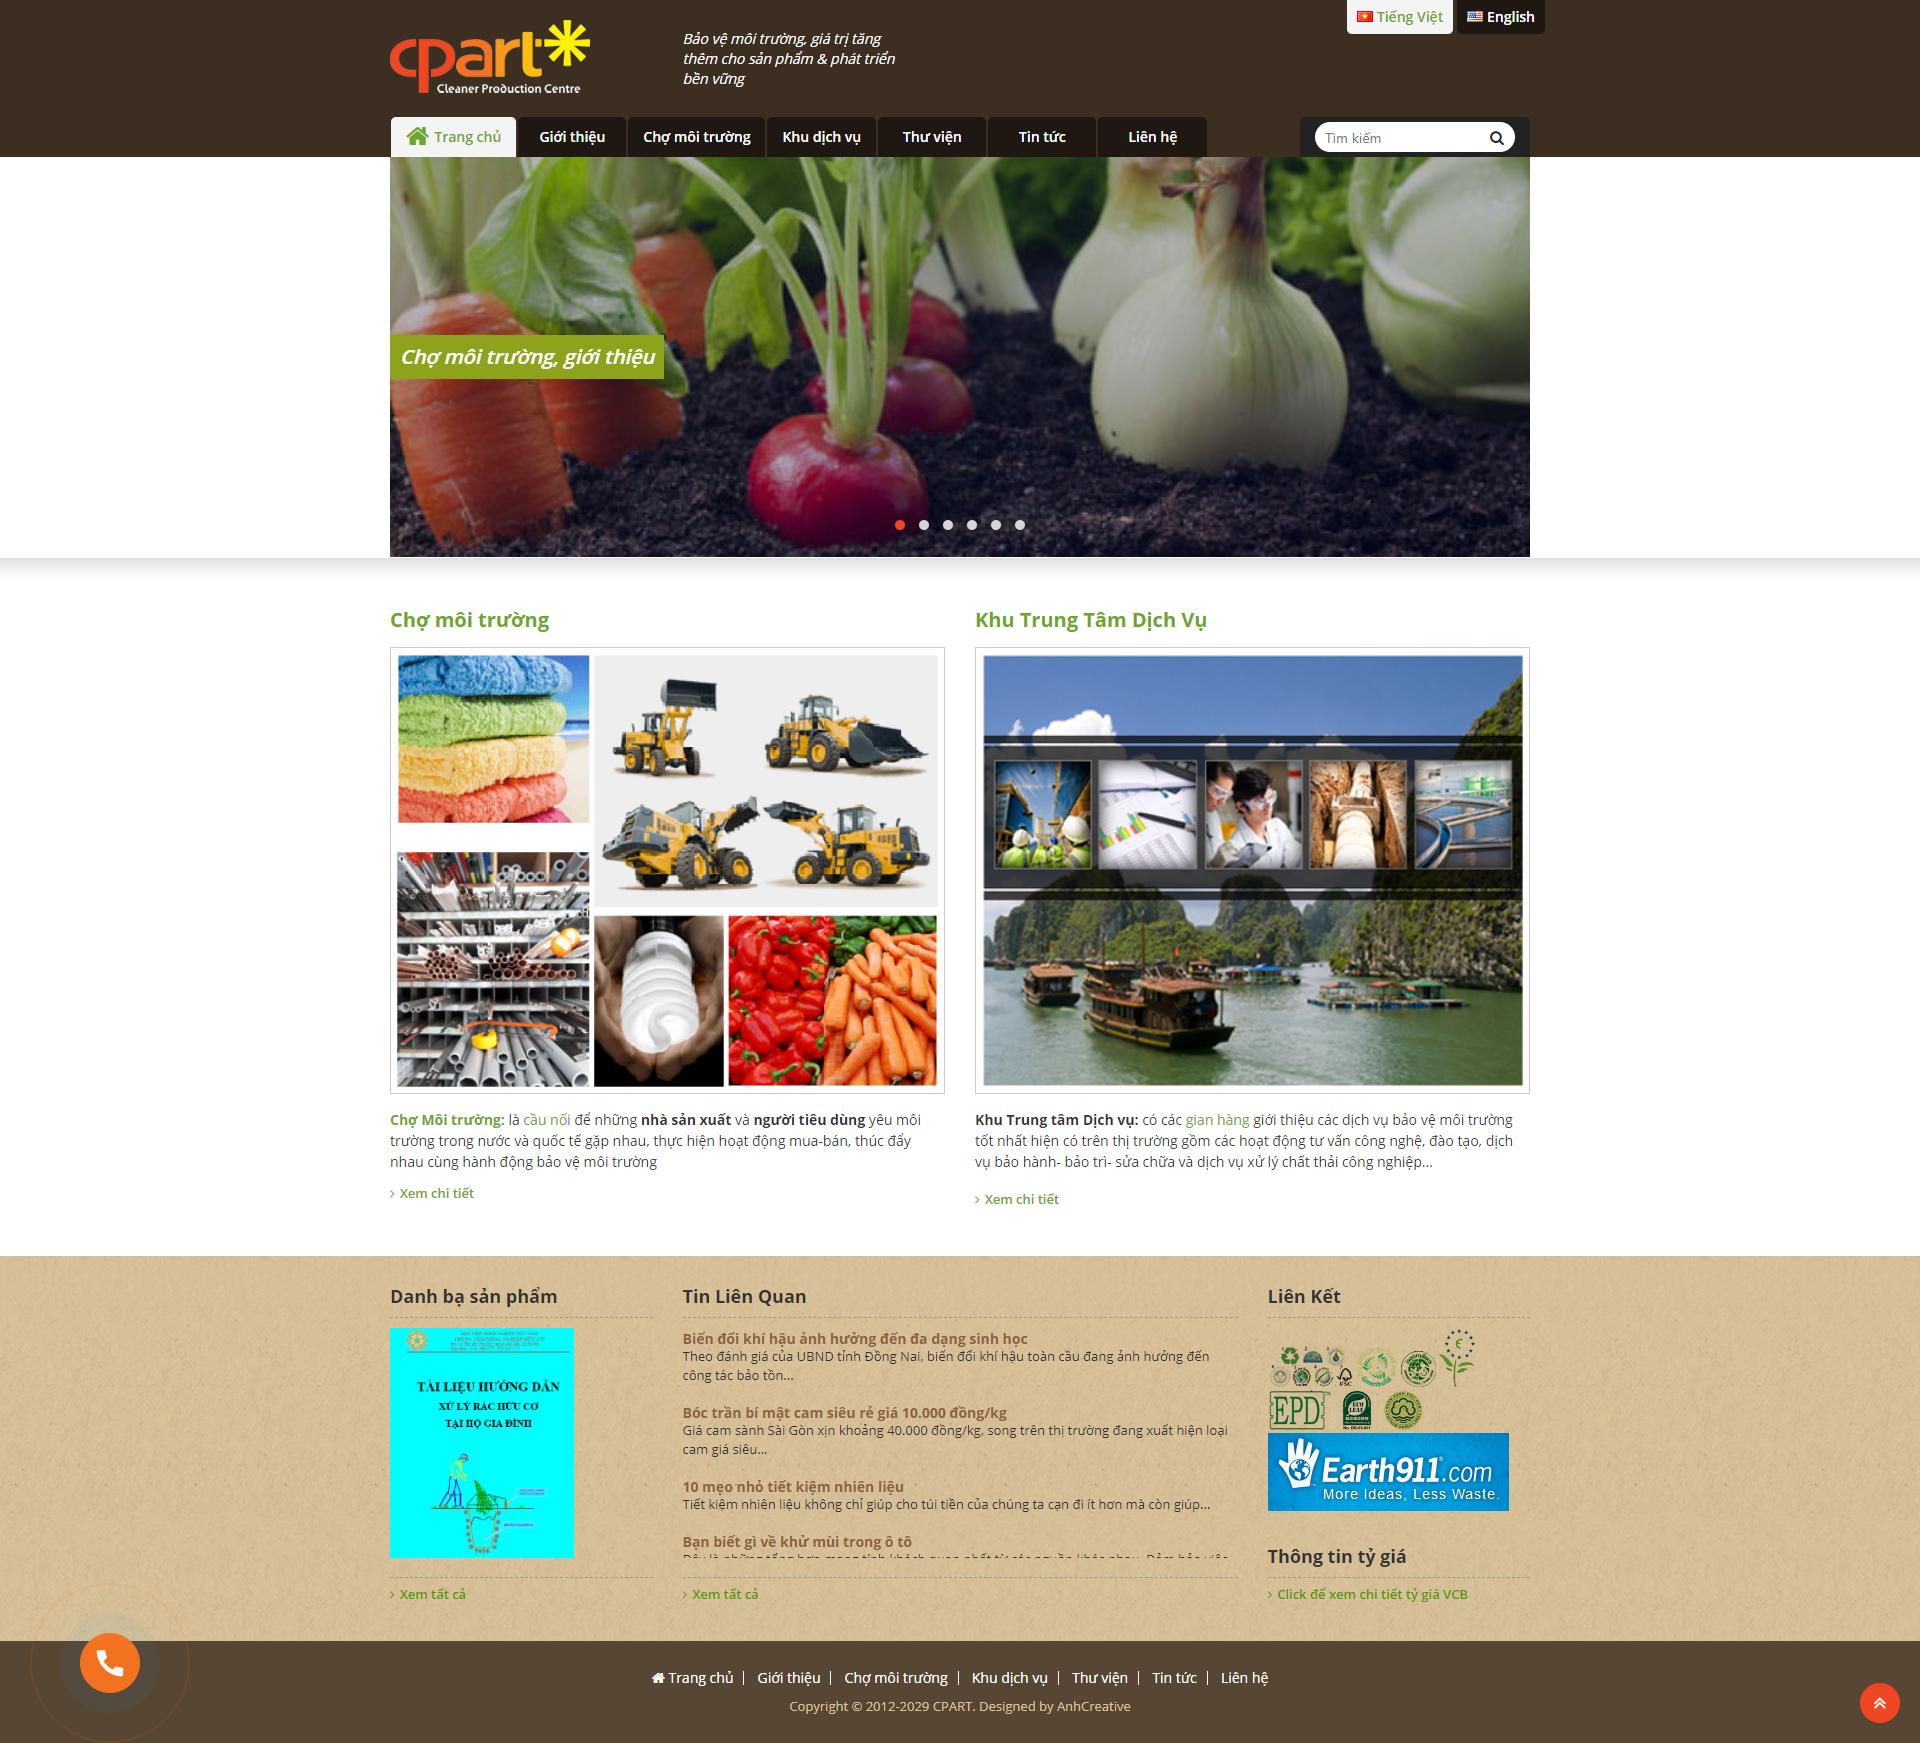 Thiết kế website sản xuất sạch Cpart